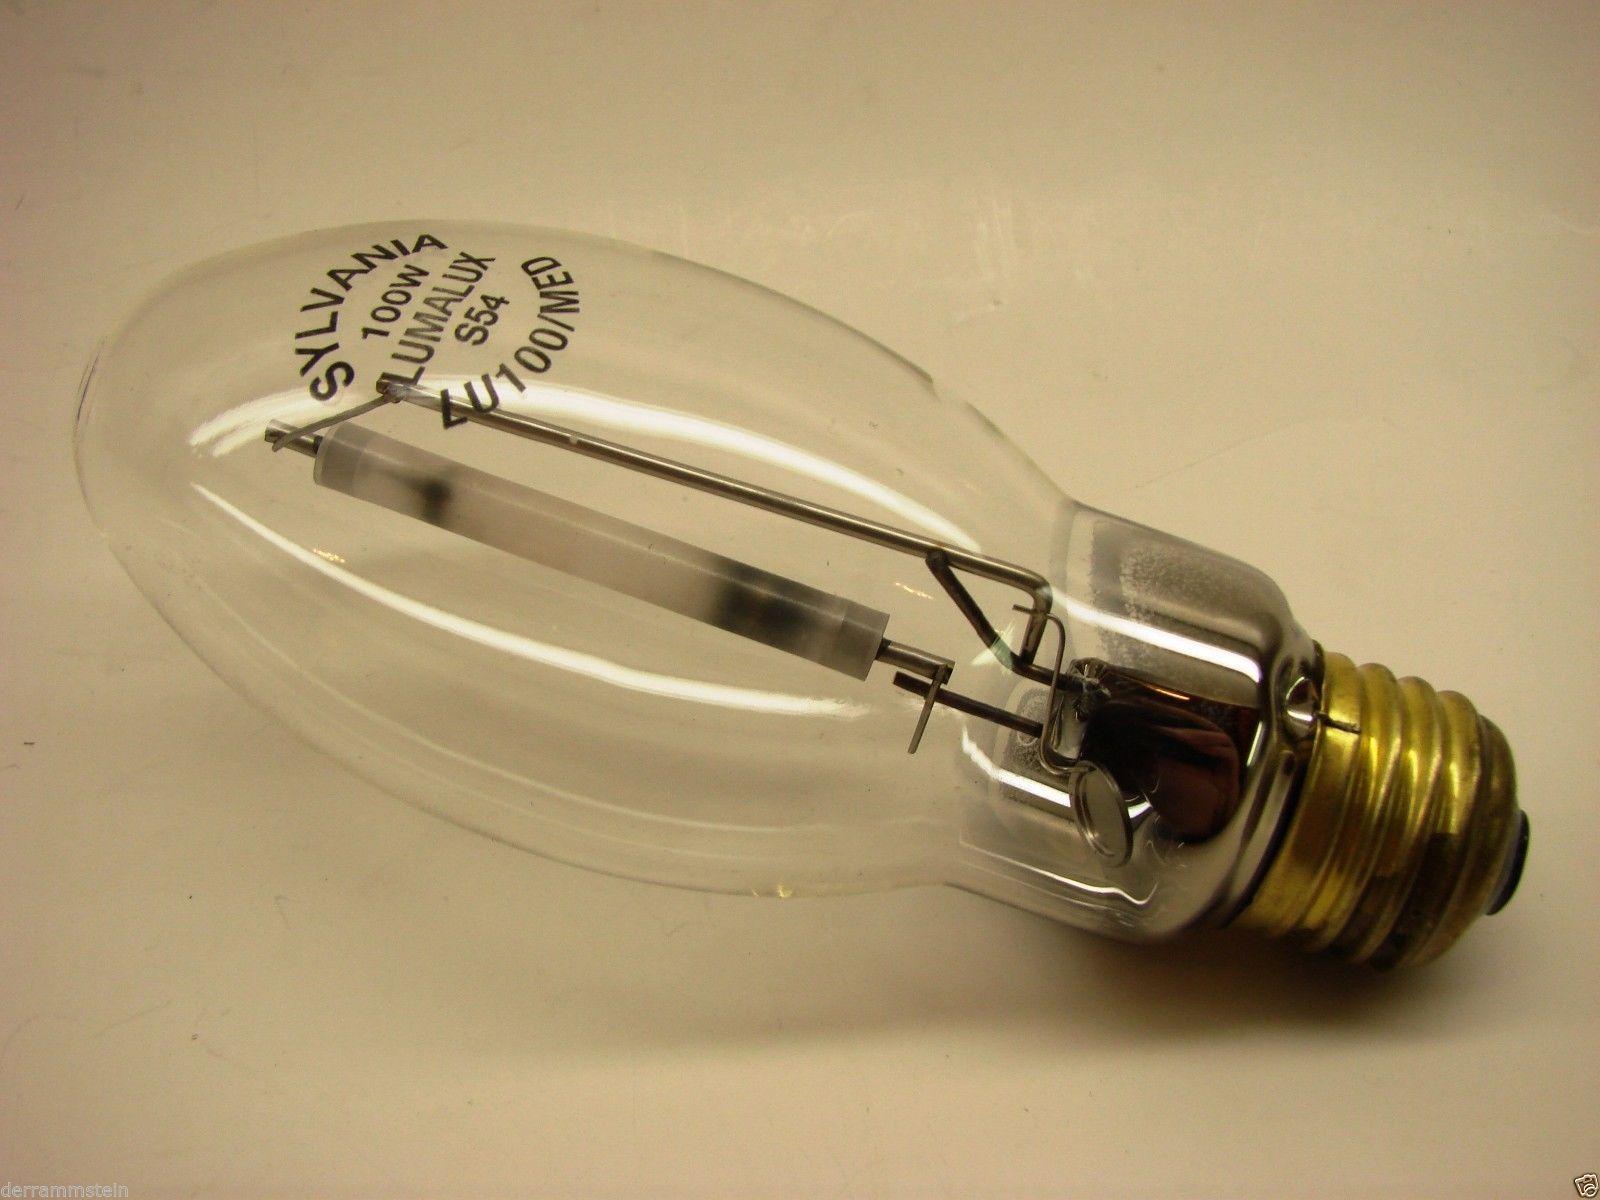 Sylvania Lumalux 100W LU100/MED S54 HPS Light Bulbs - LOT OF (4)             b12